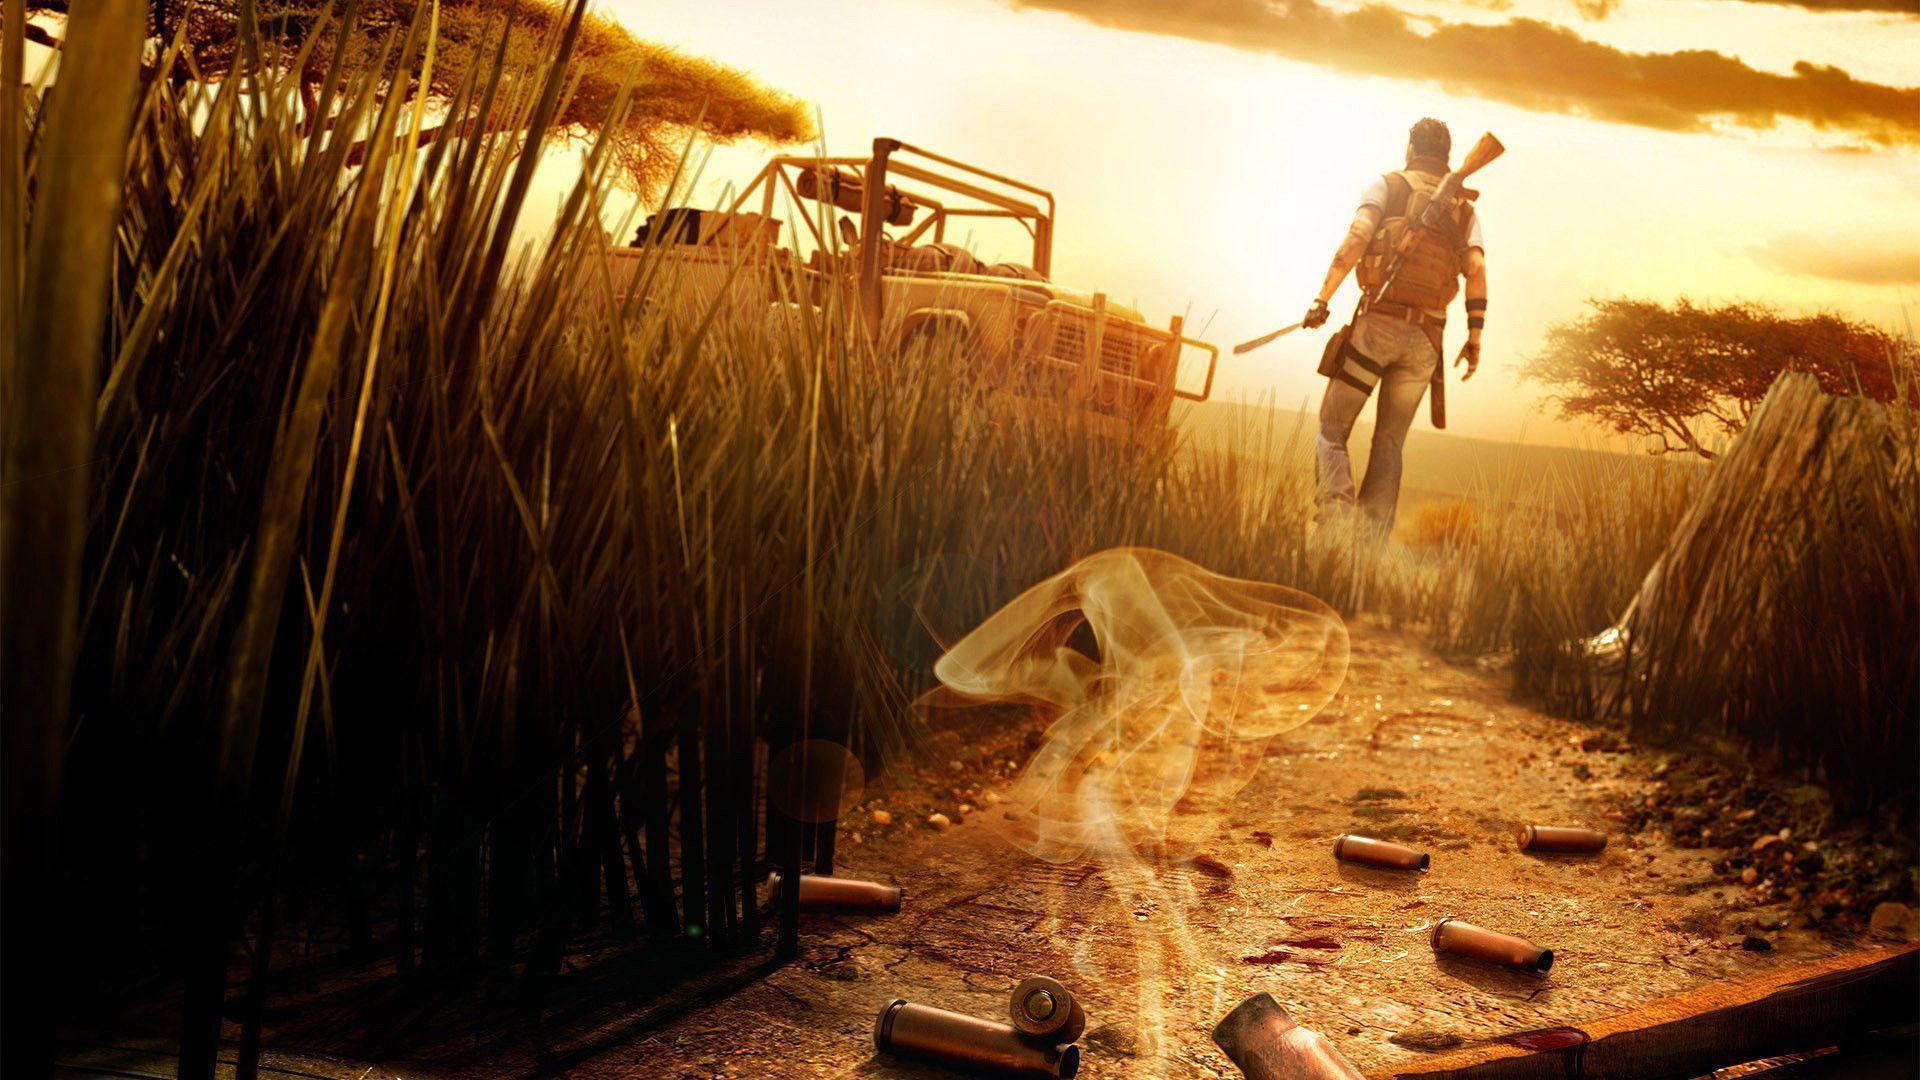 Far Cry 2 Wallpaper HD